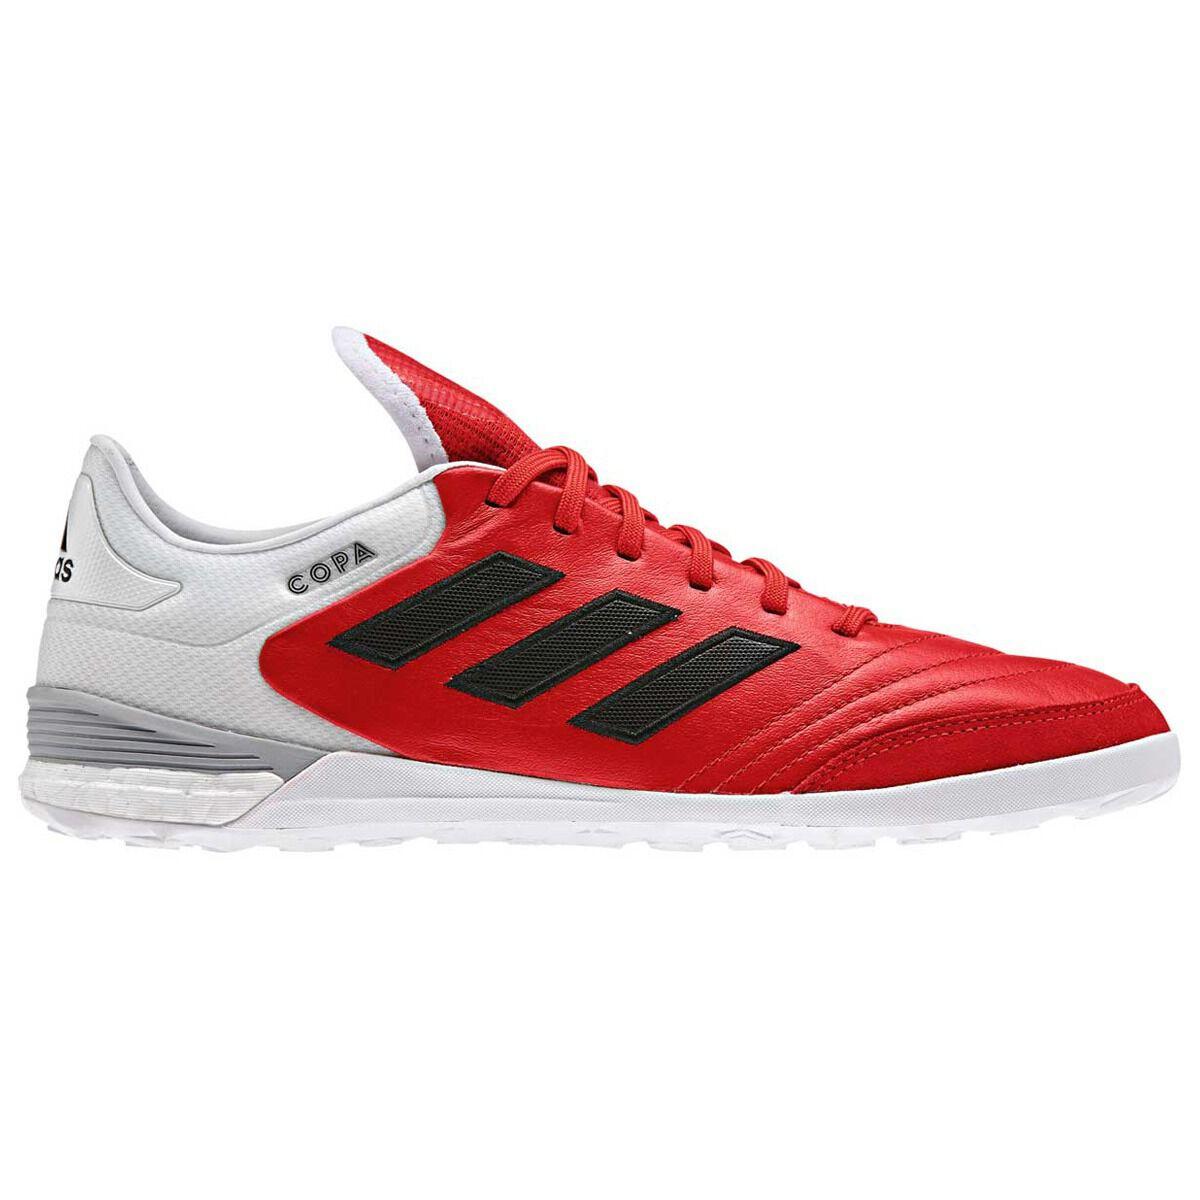 1fefa2ba4d8 ... canada adidas copa tango 17 mens indoor soccer shoes red black us 8  adult red a5eae